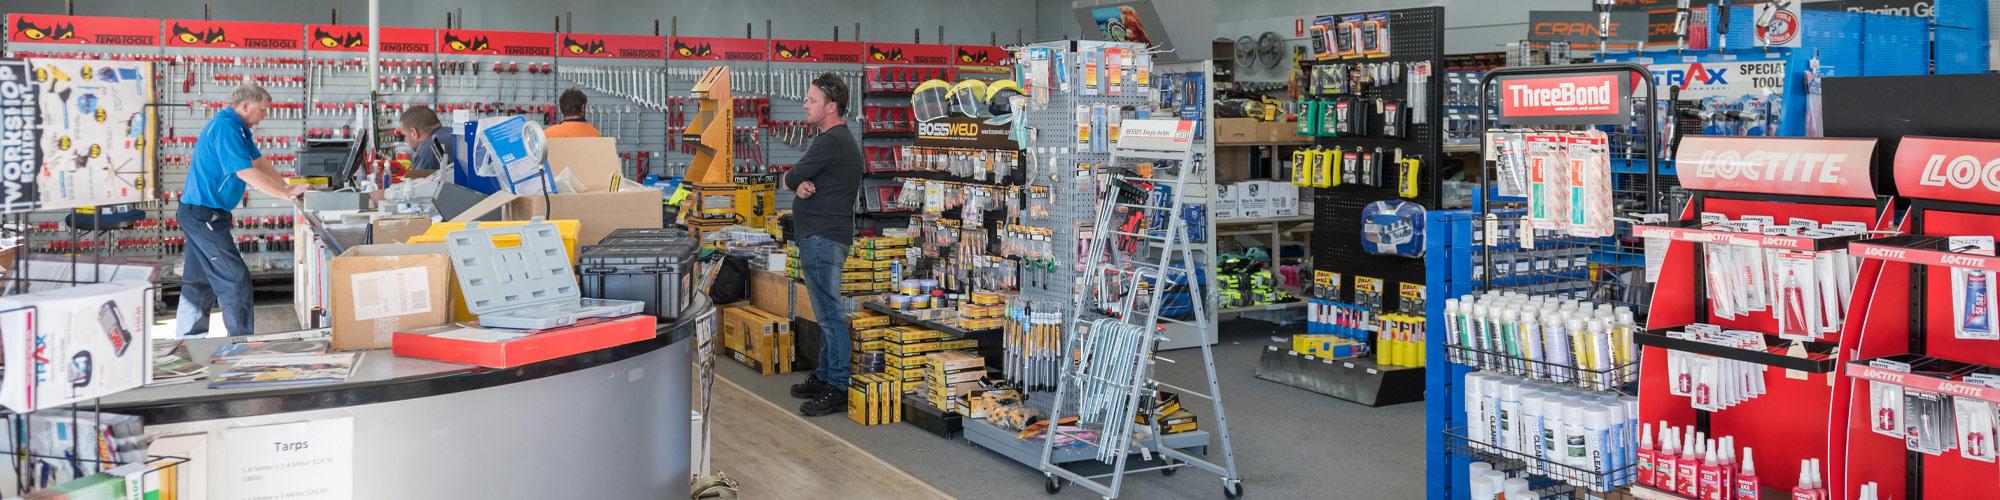 Gippsland Bearing Supplies Sale store interior